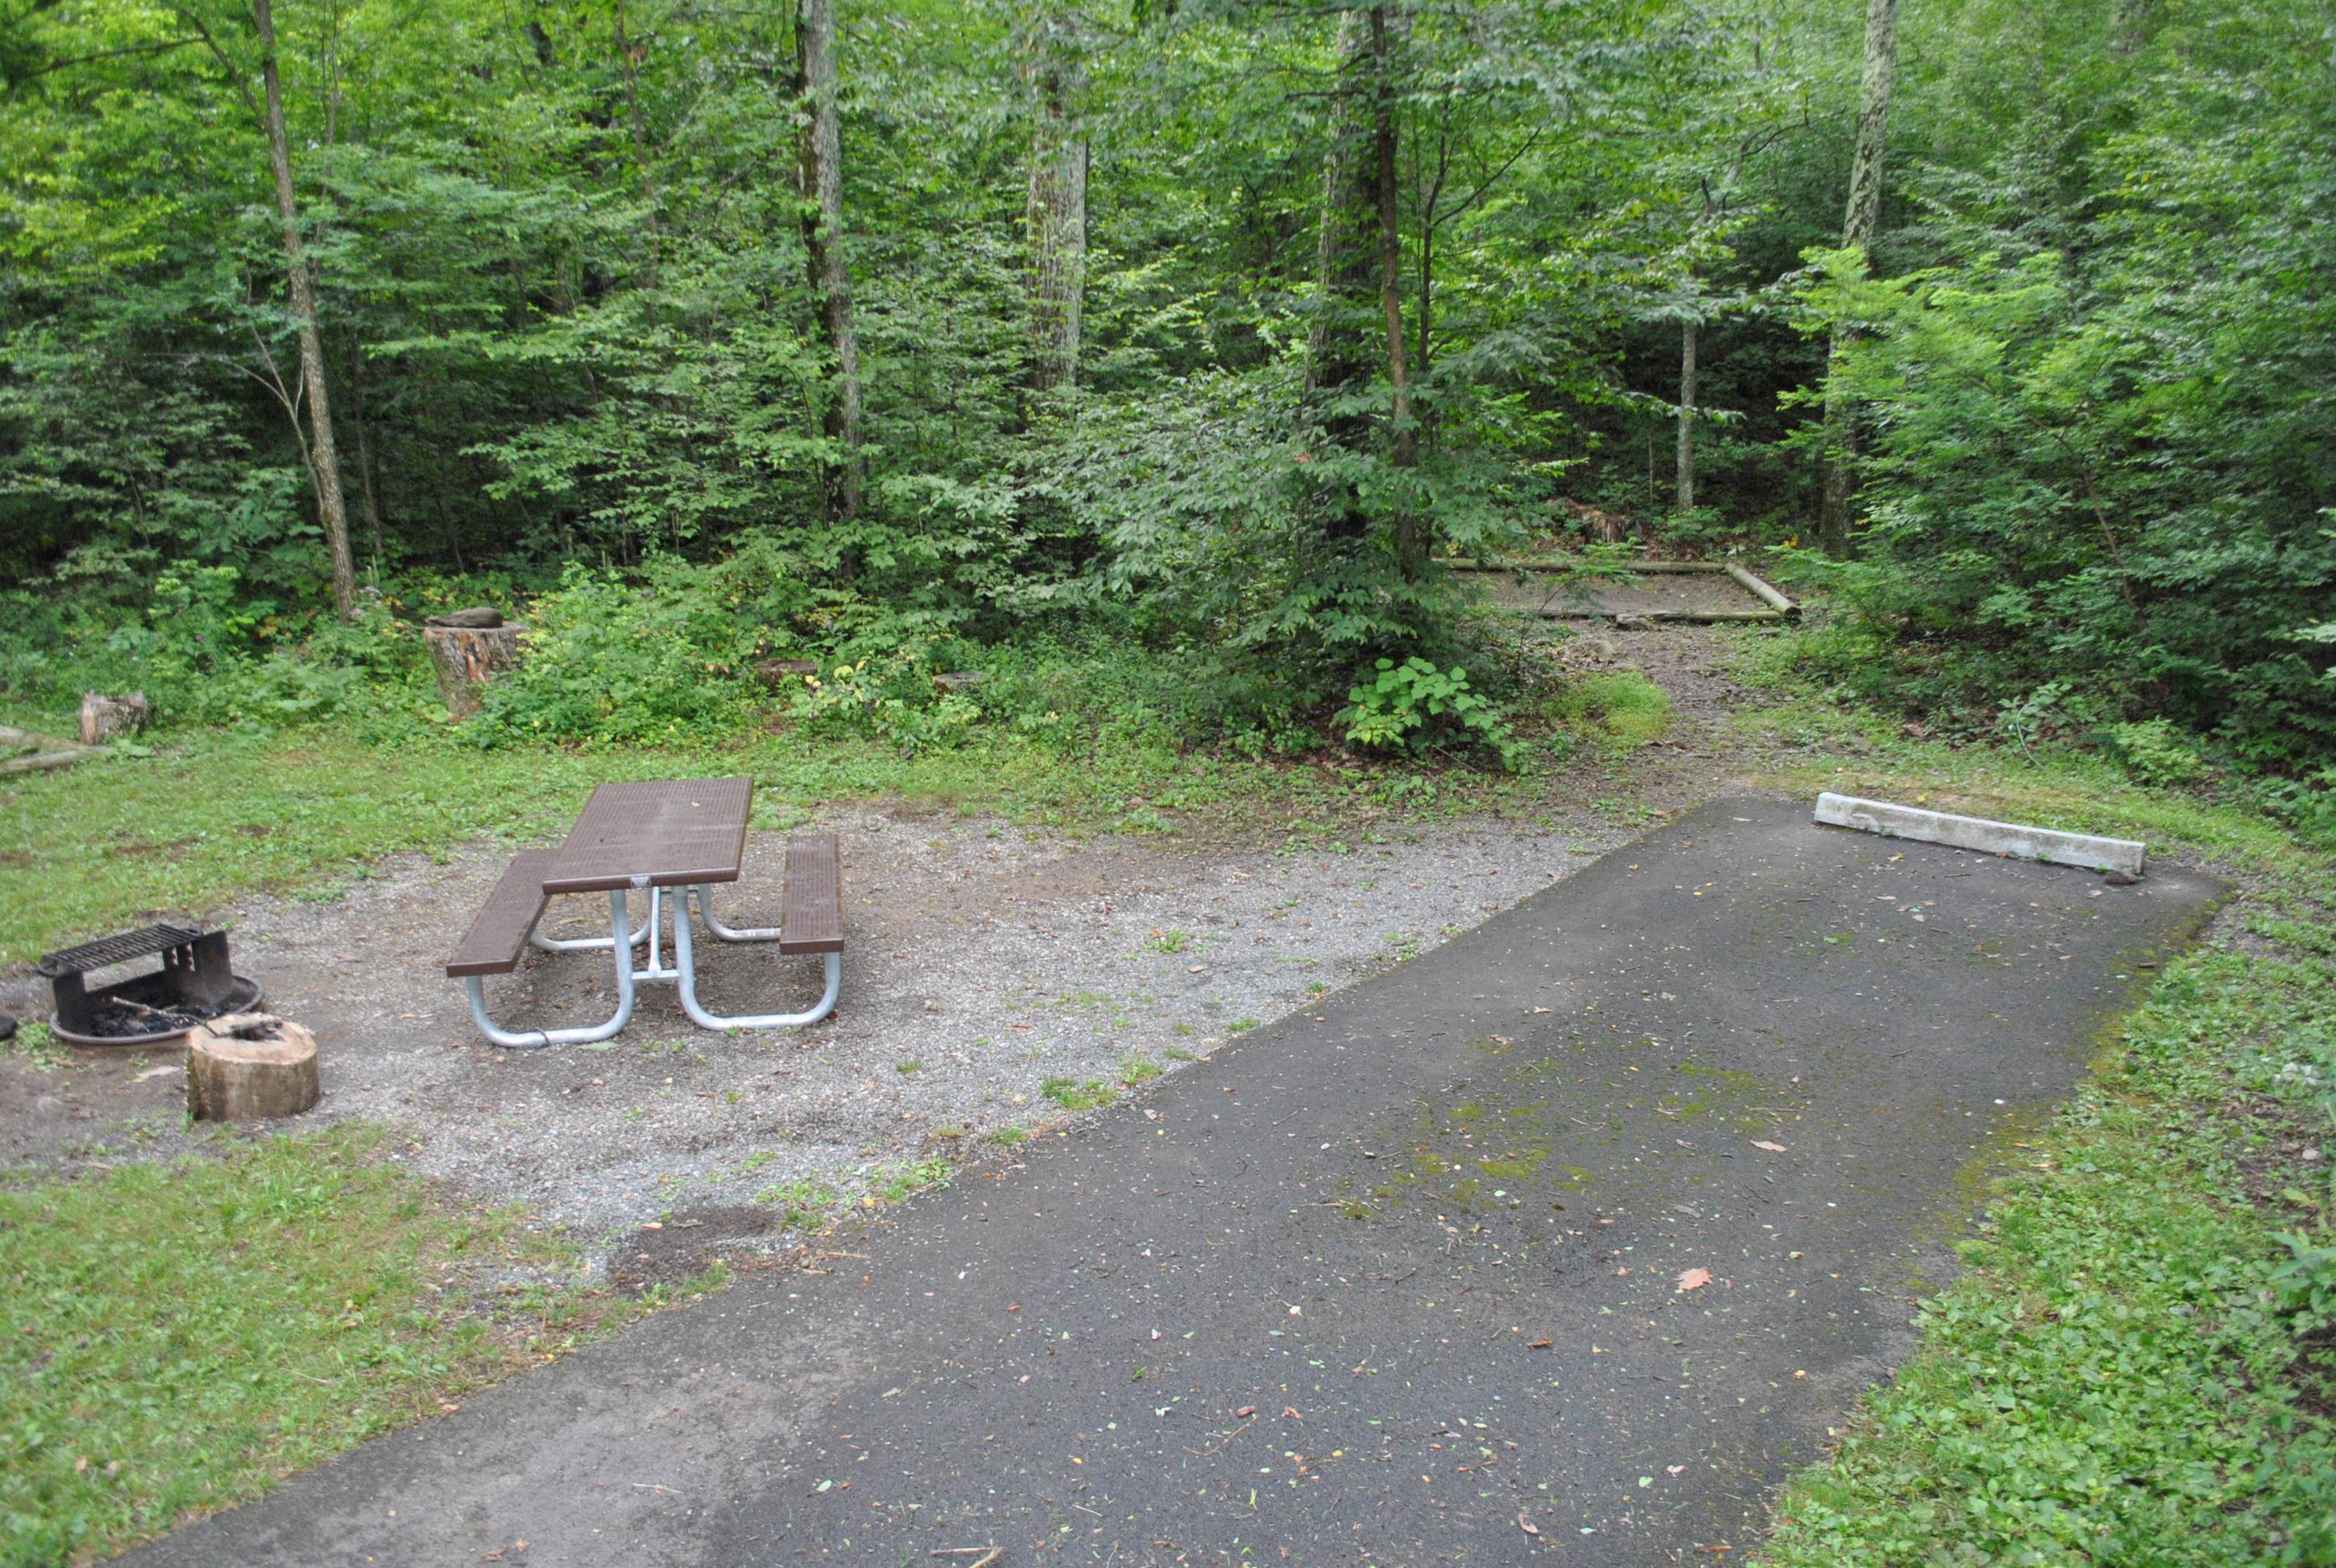 Mathews Arm Campground - Site B139